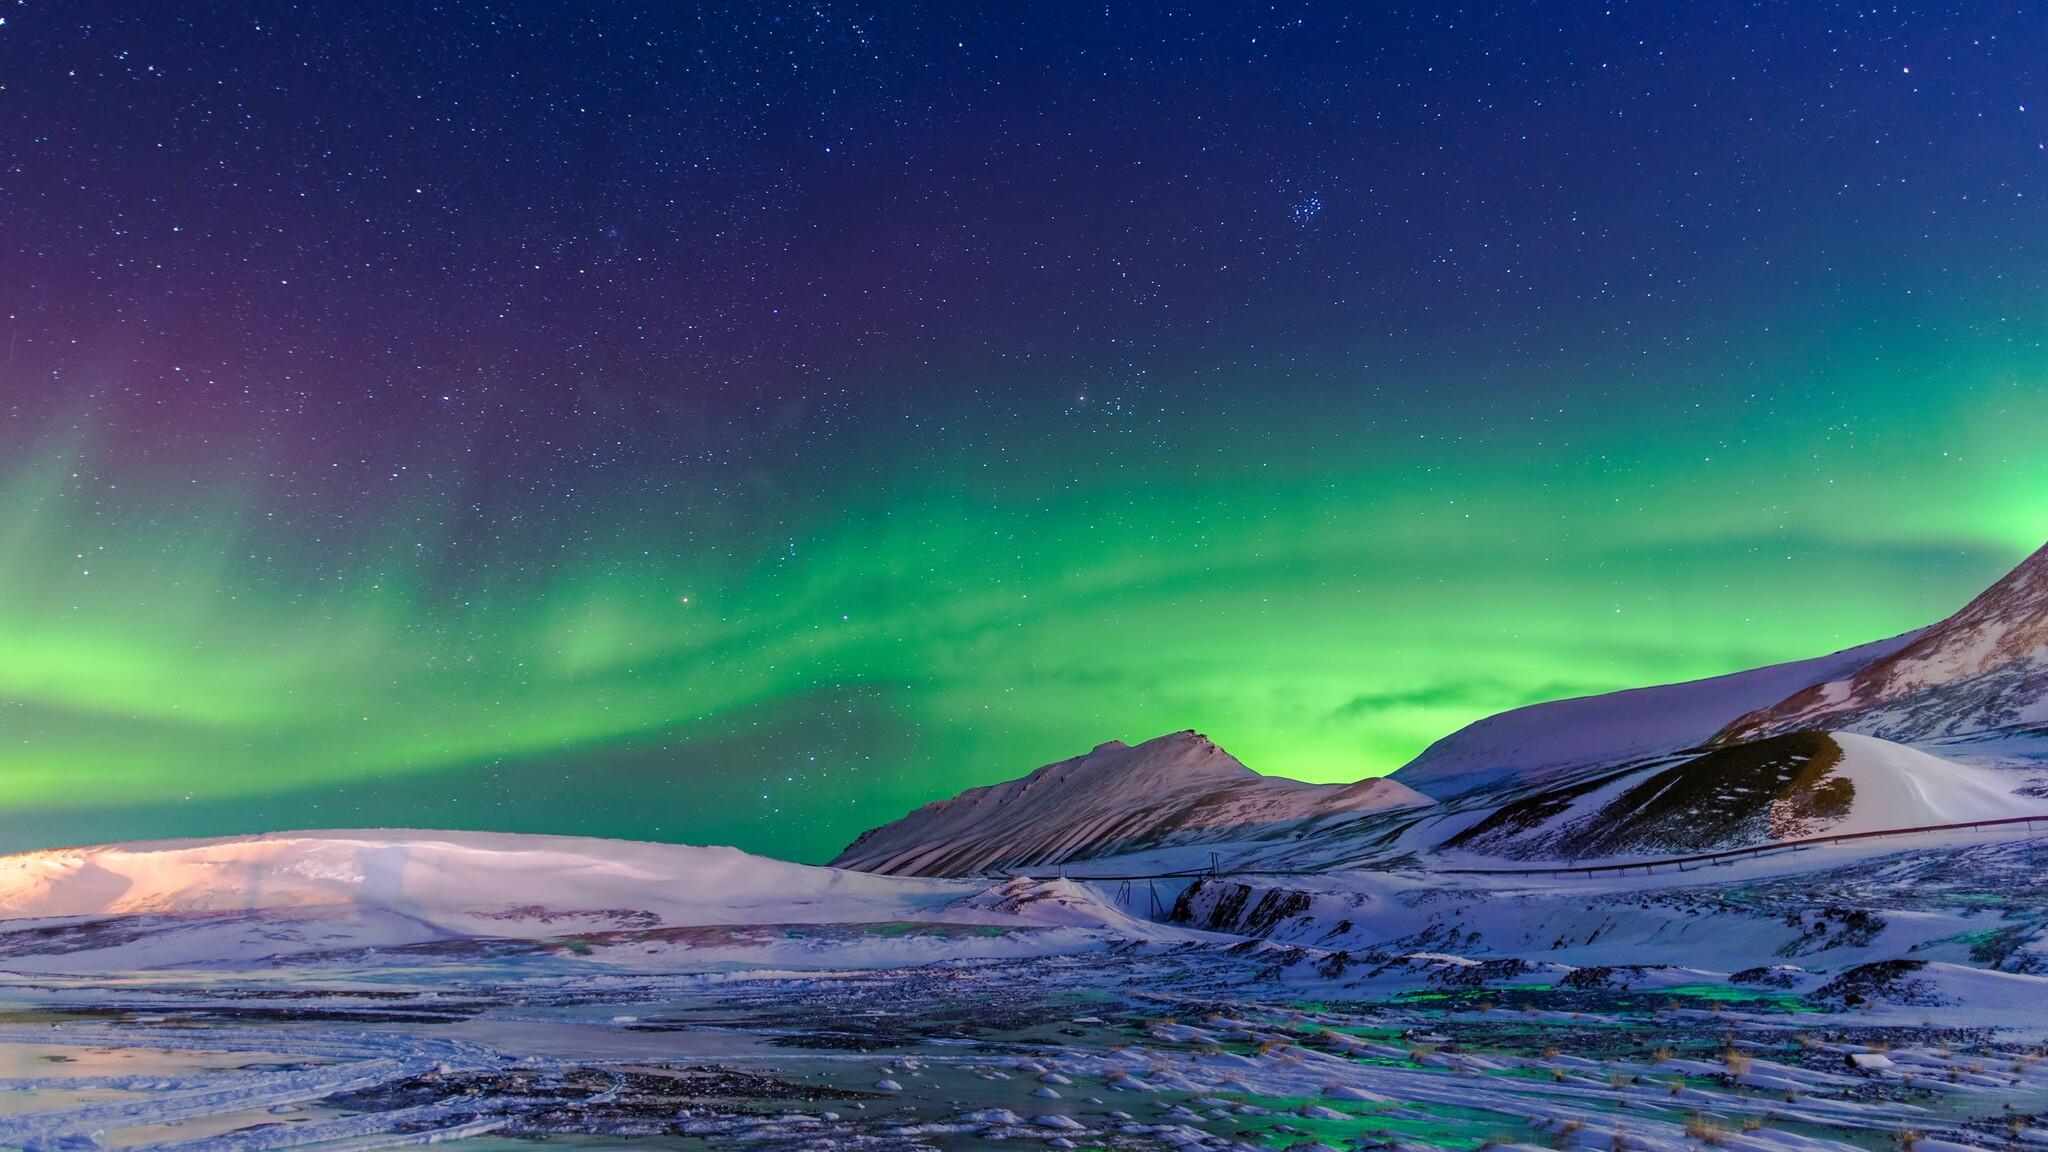 aurora-borealis-4k-0f.jpg